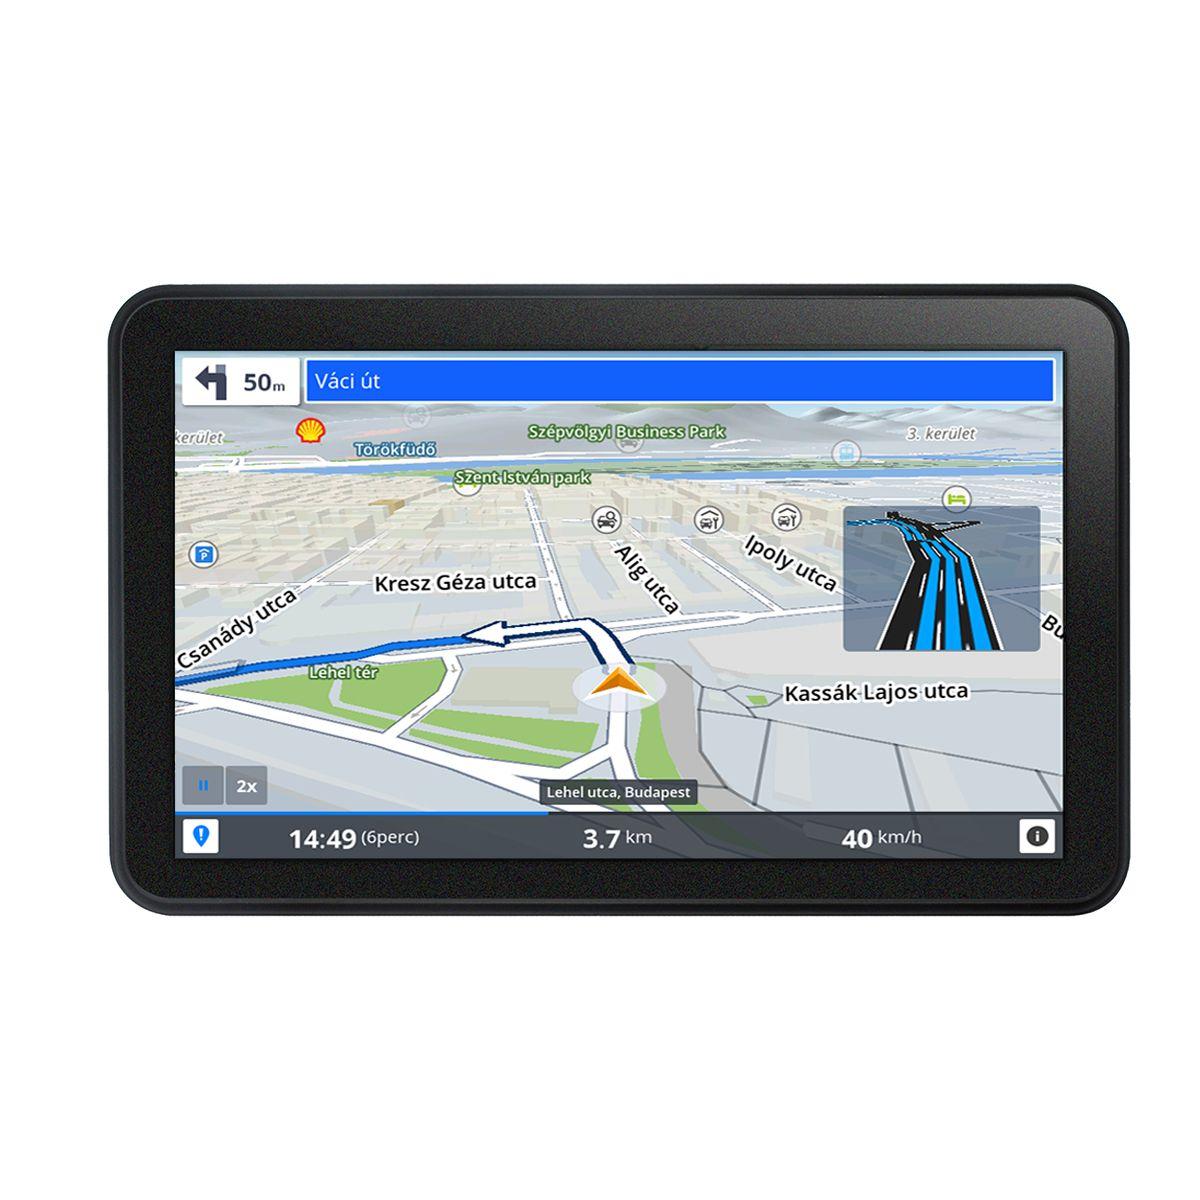 Wayteq X995 Max Android Gps Navigacio Sygic 3d Europa Terkep